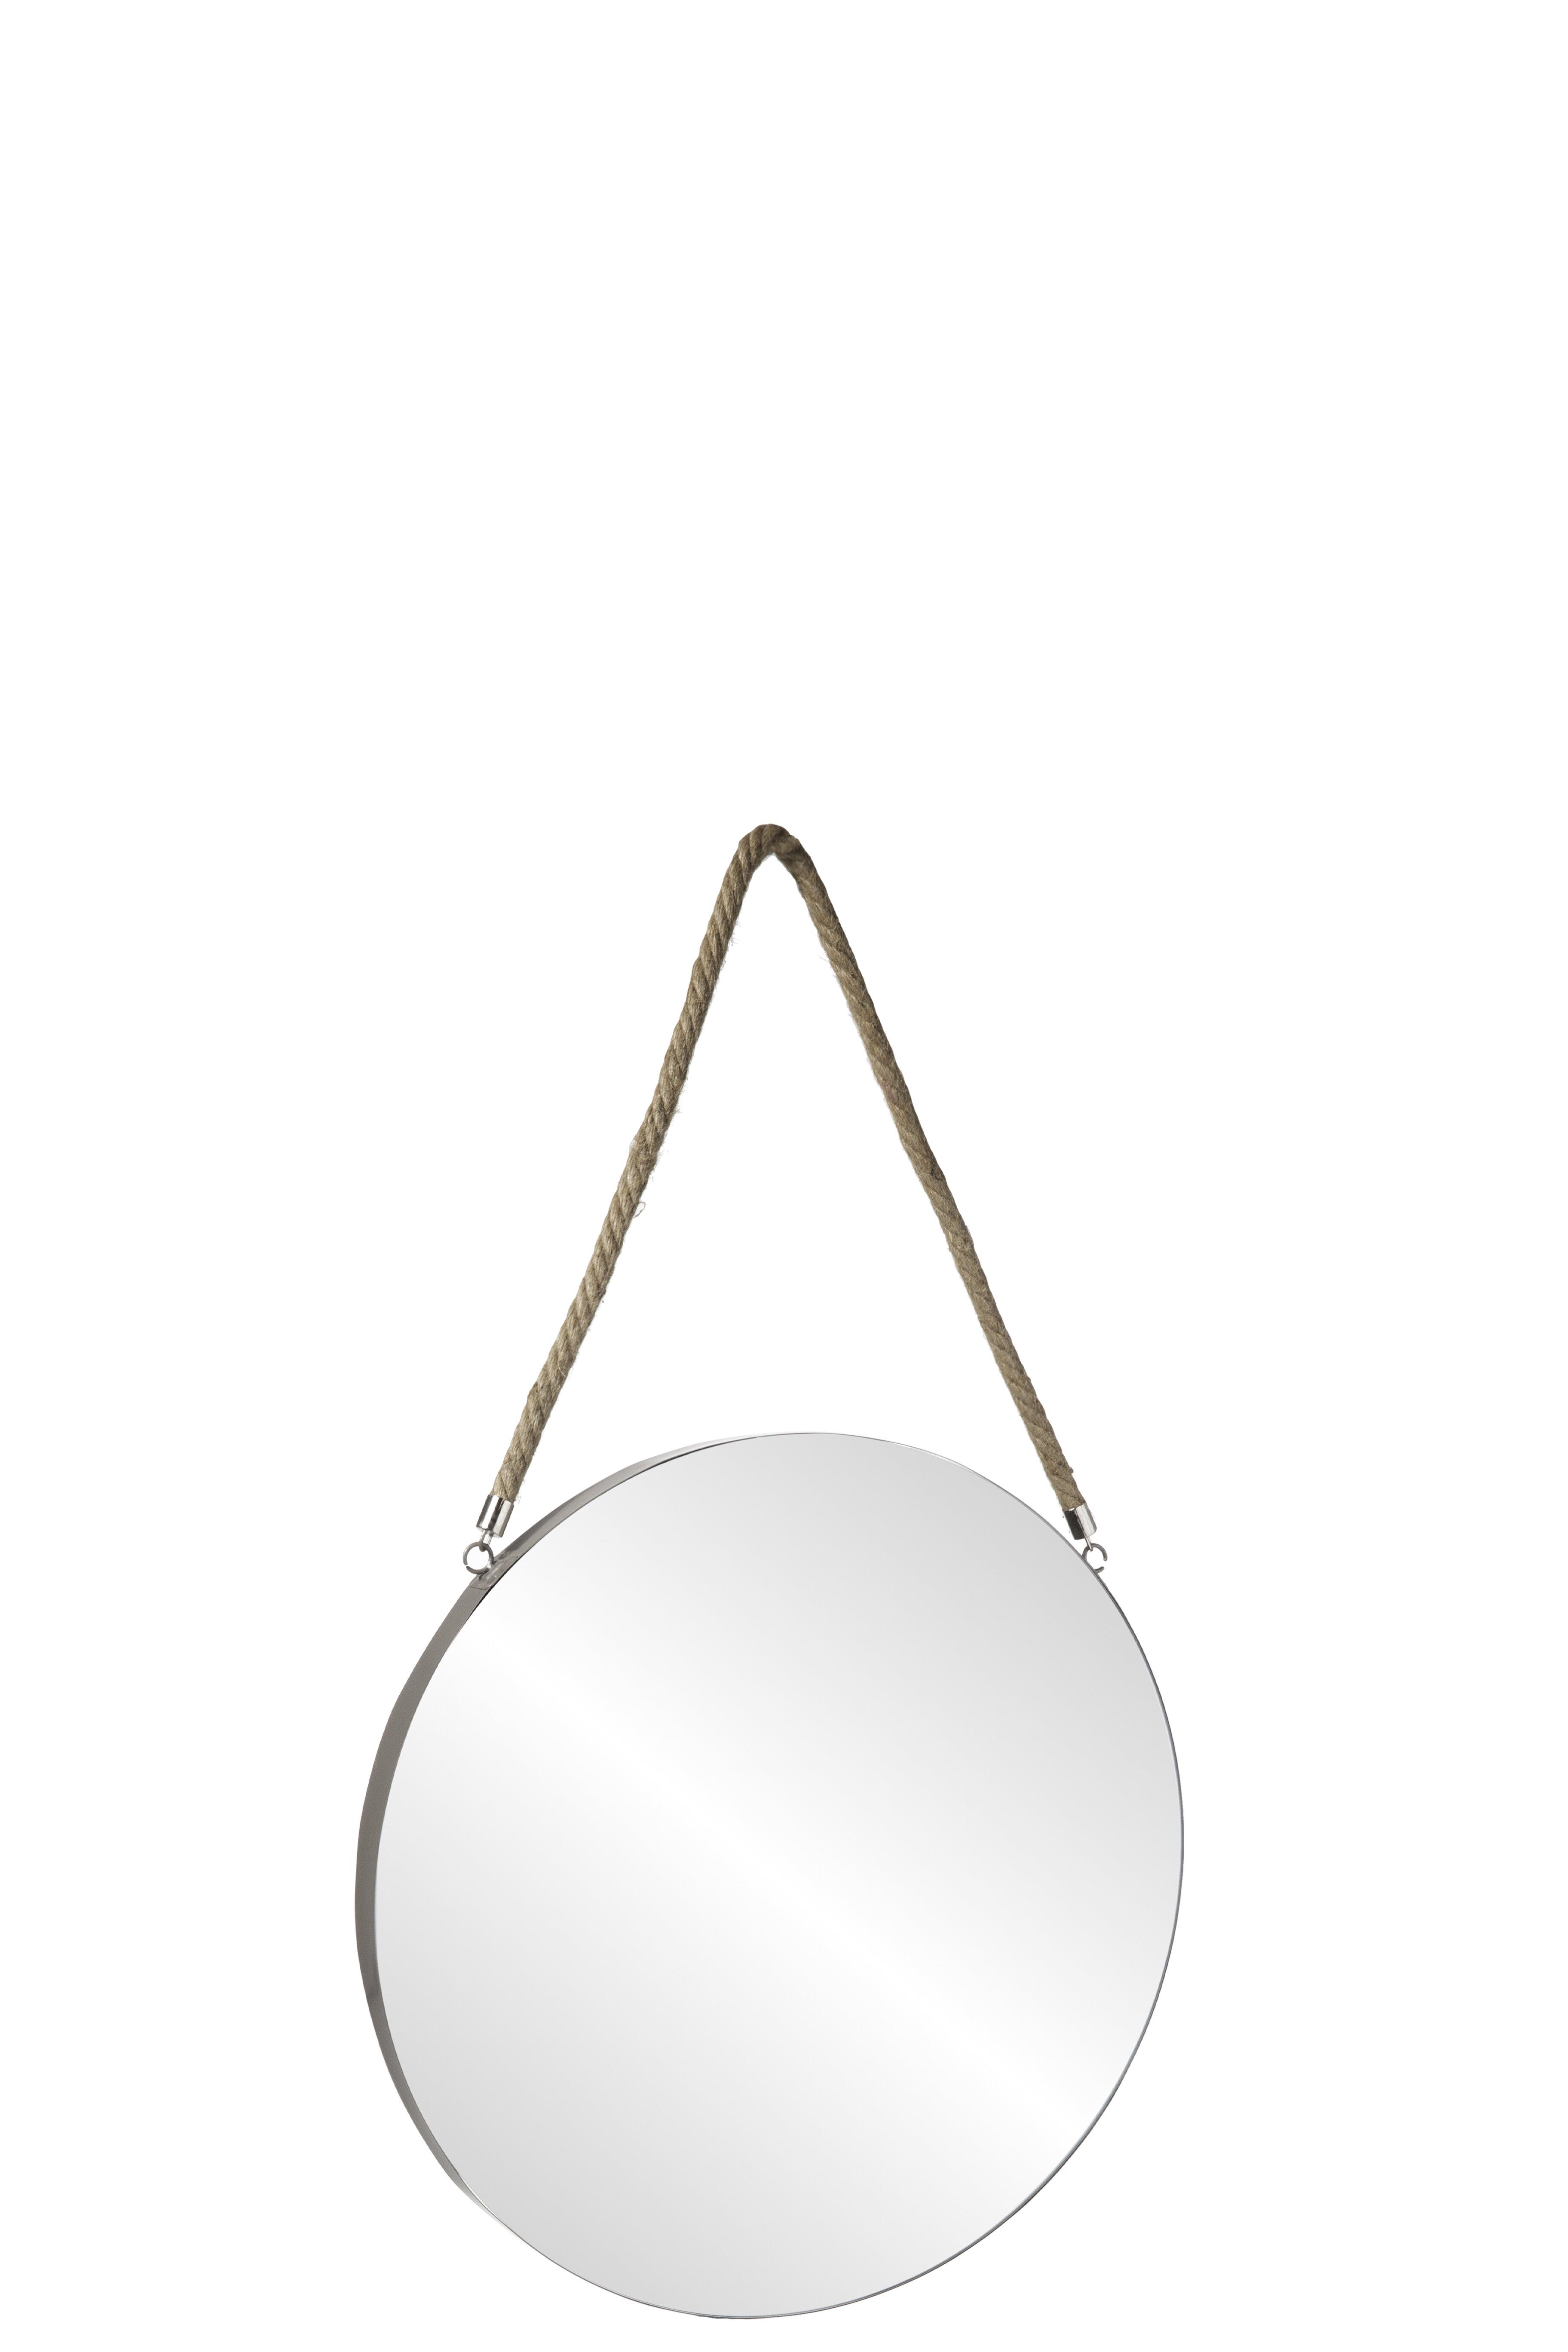 Hanging Breakwater Bay Mirrors You Ll Love In 2021 Wayfair